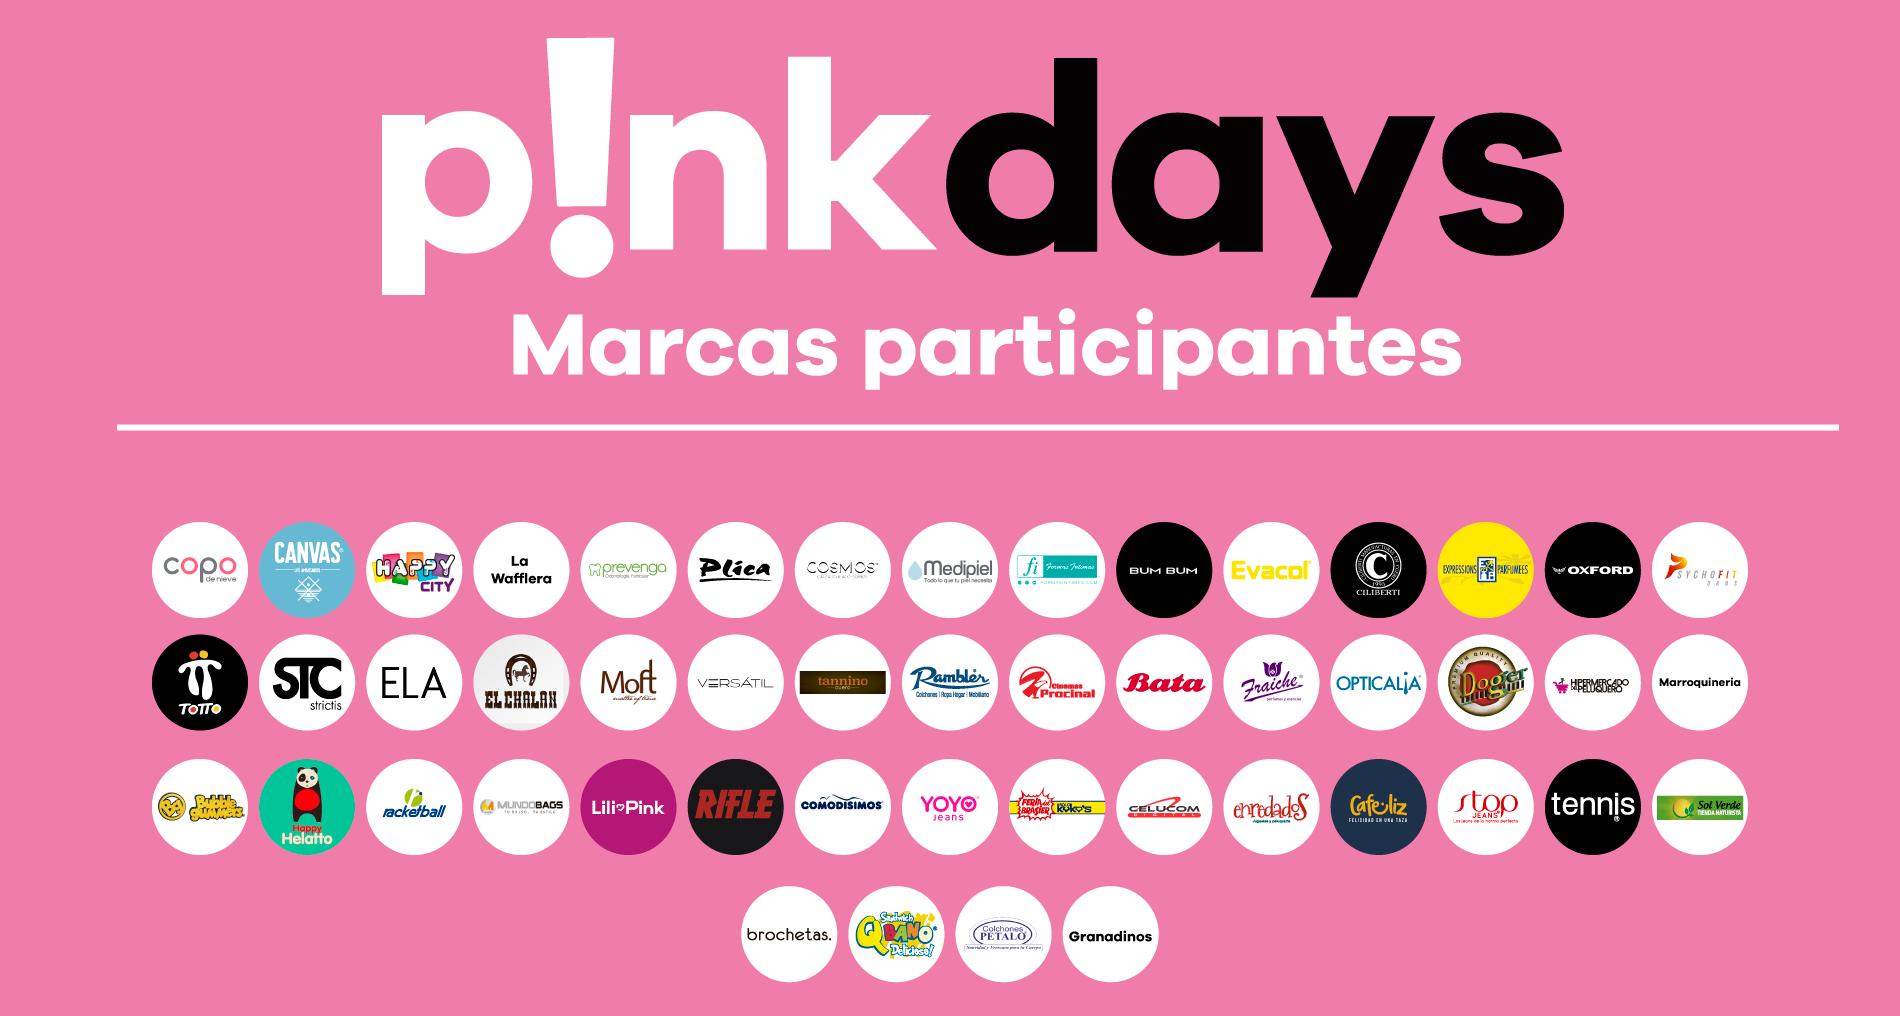 Pink days - La ceja